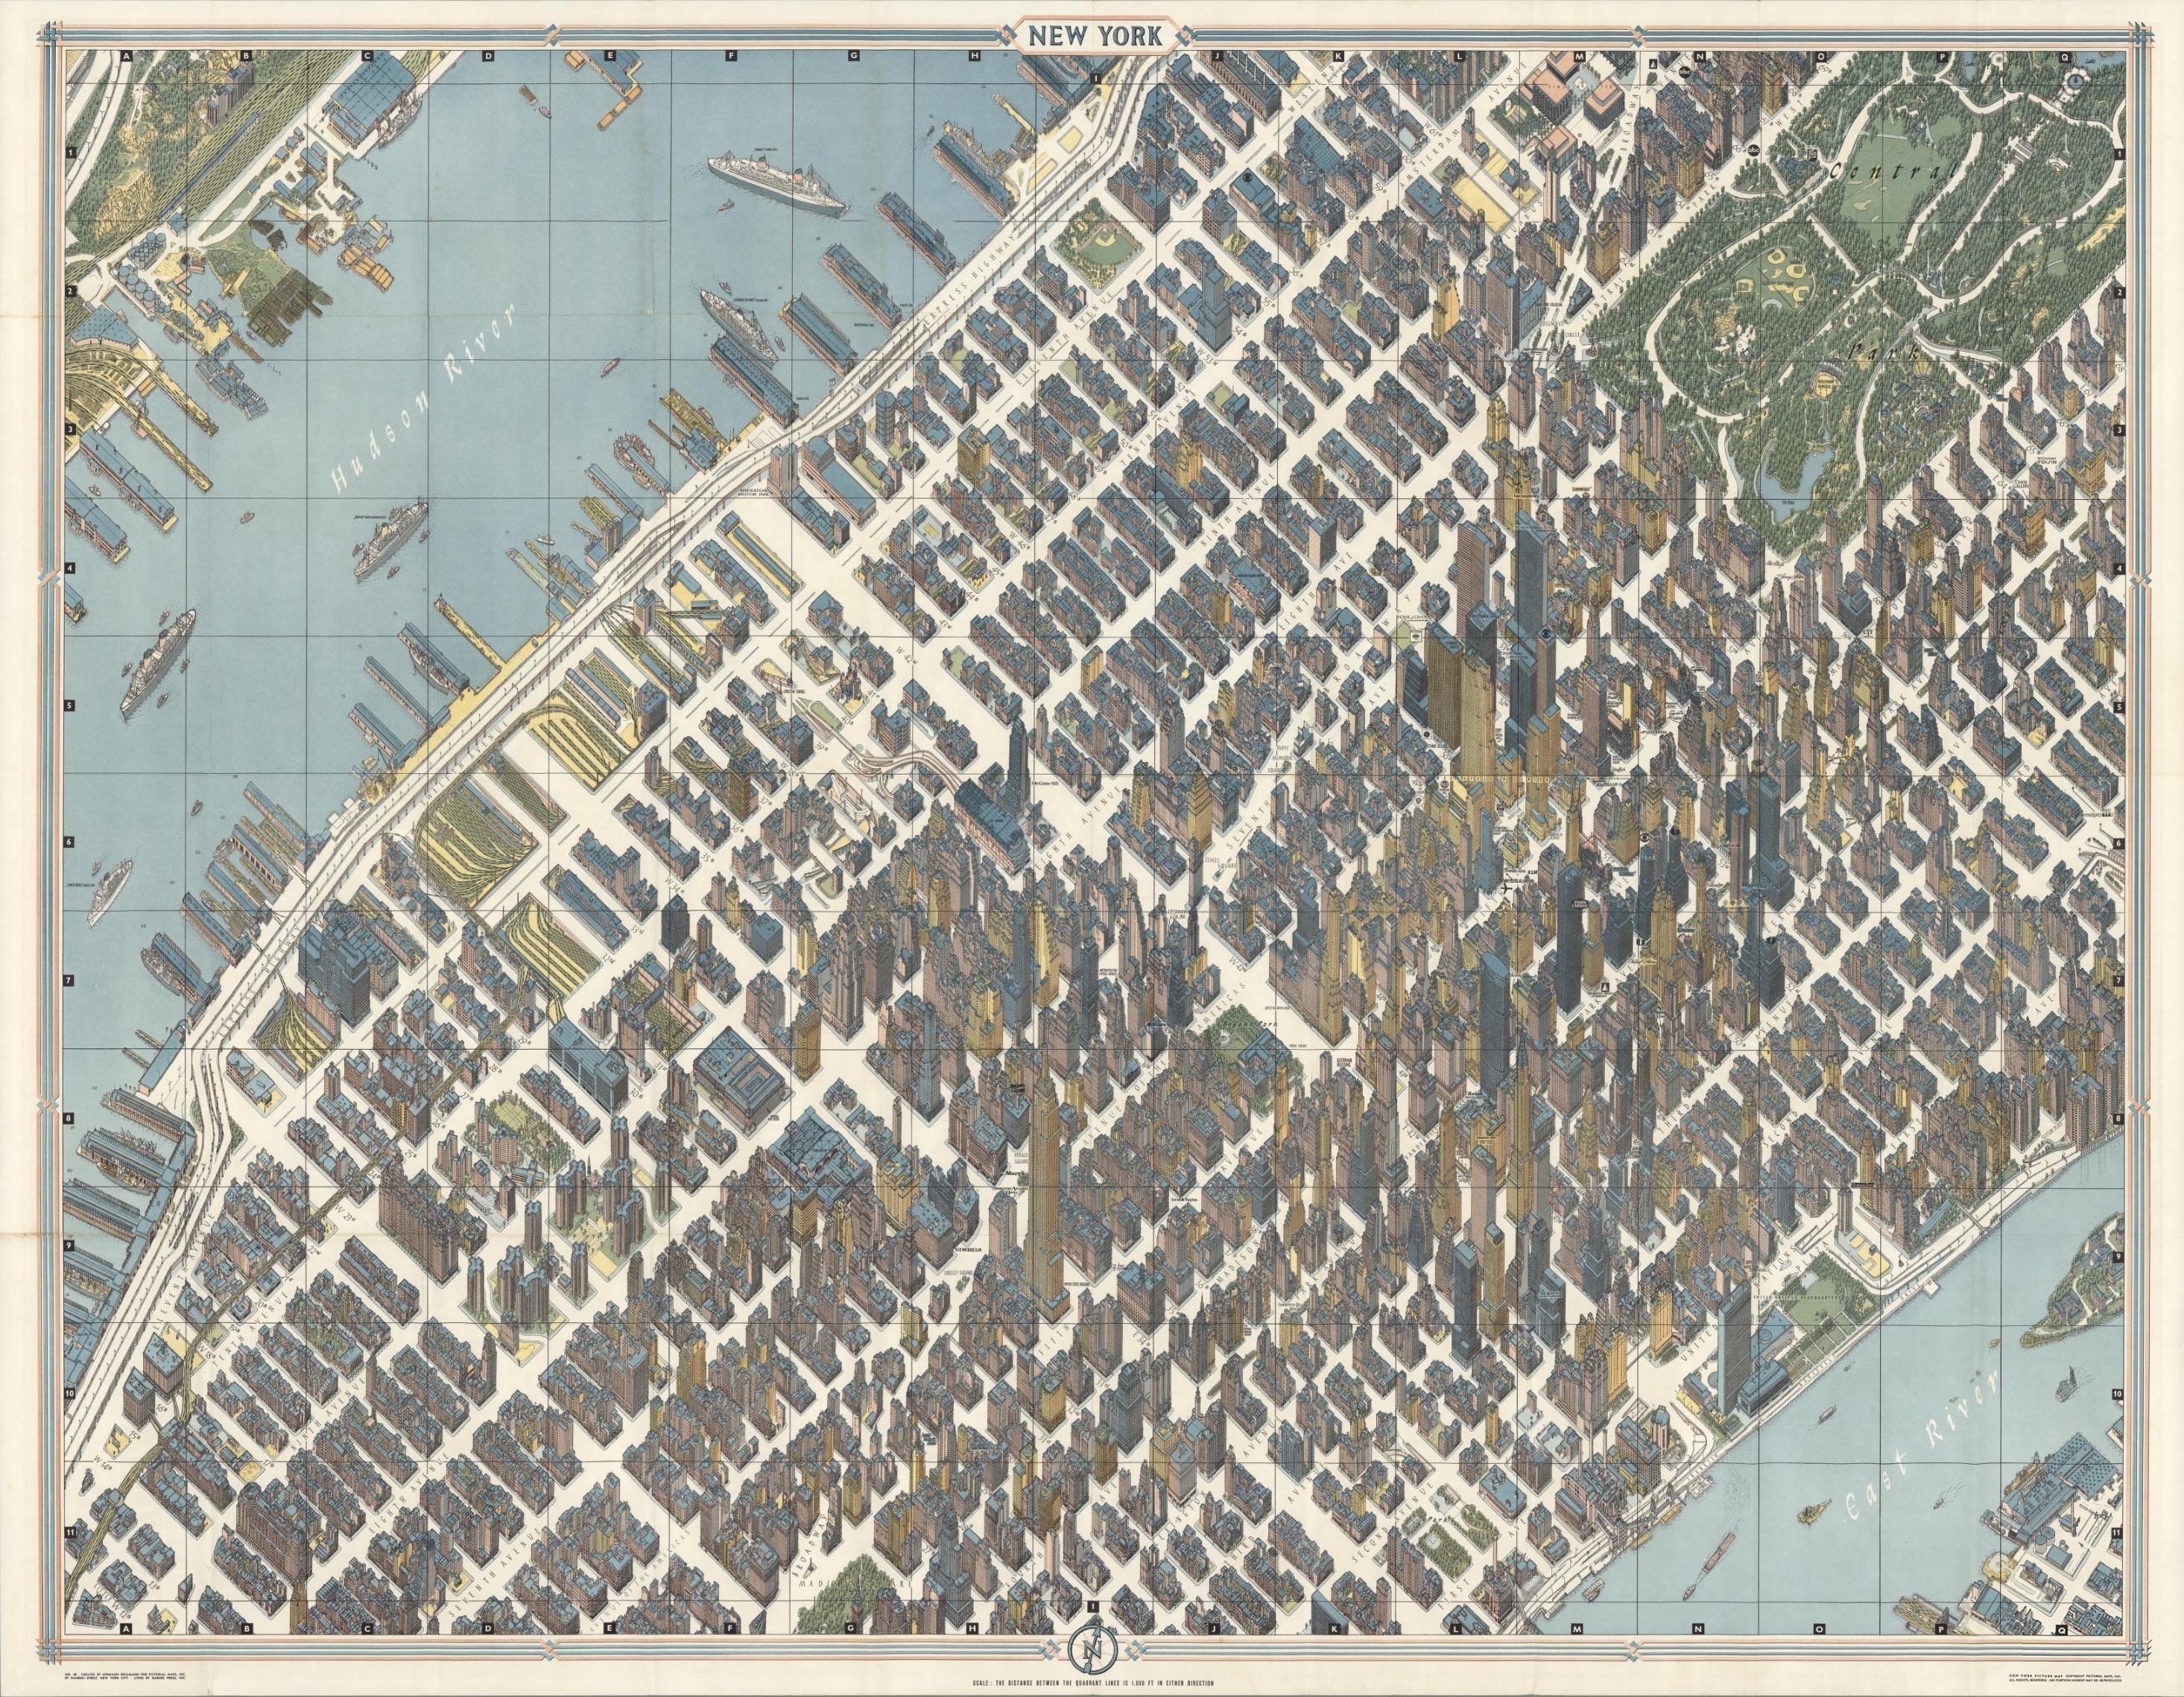 Best Ville Images On Pinterest - New york map restoration hardware